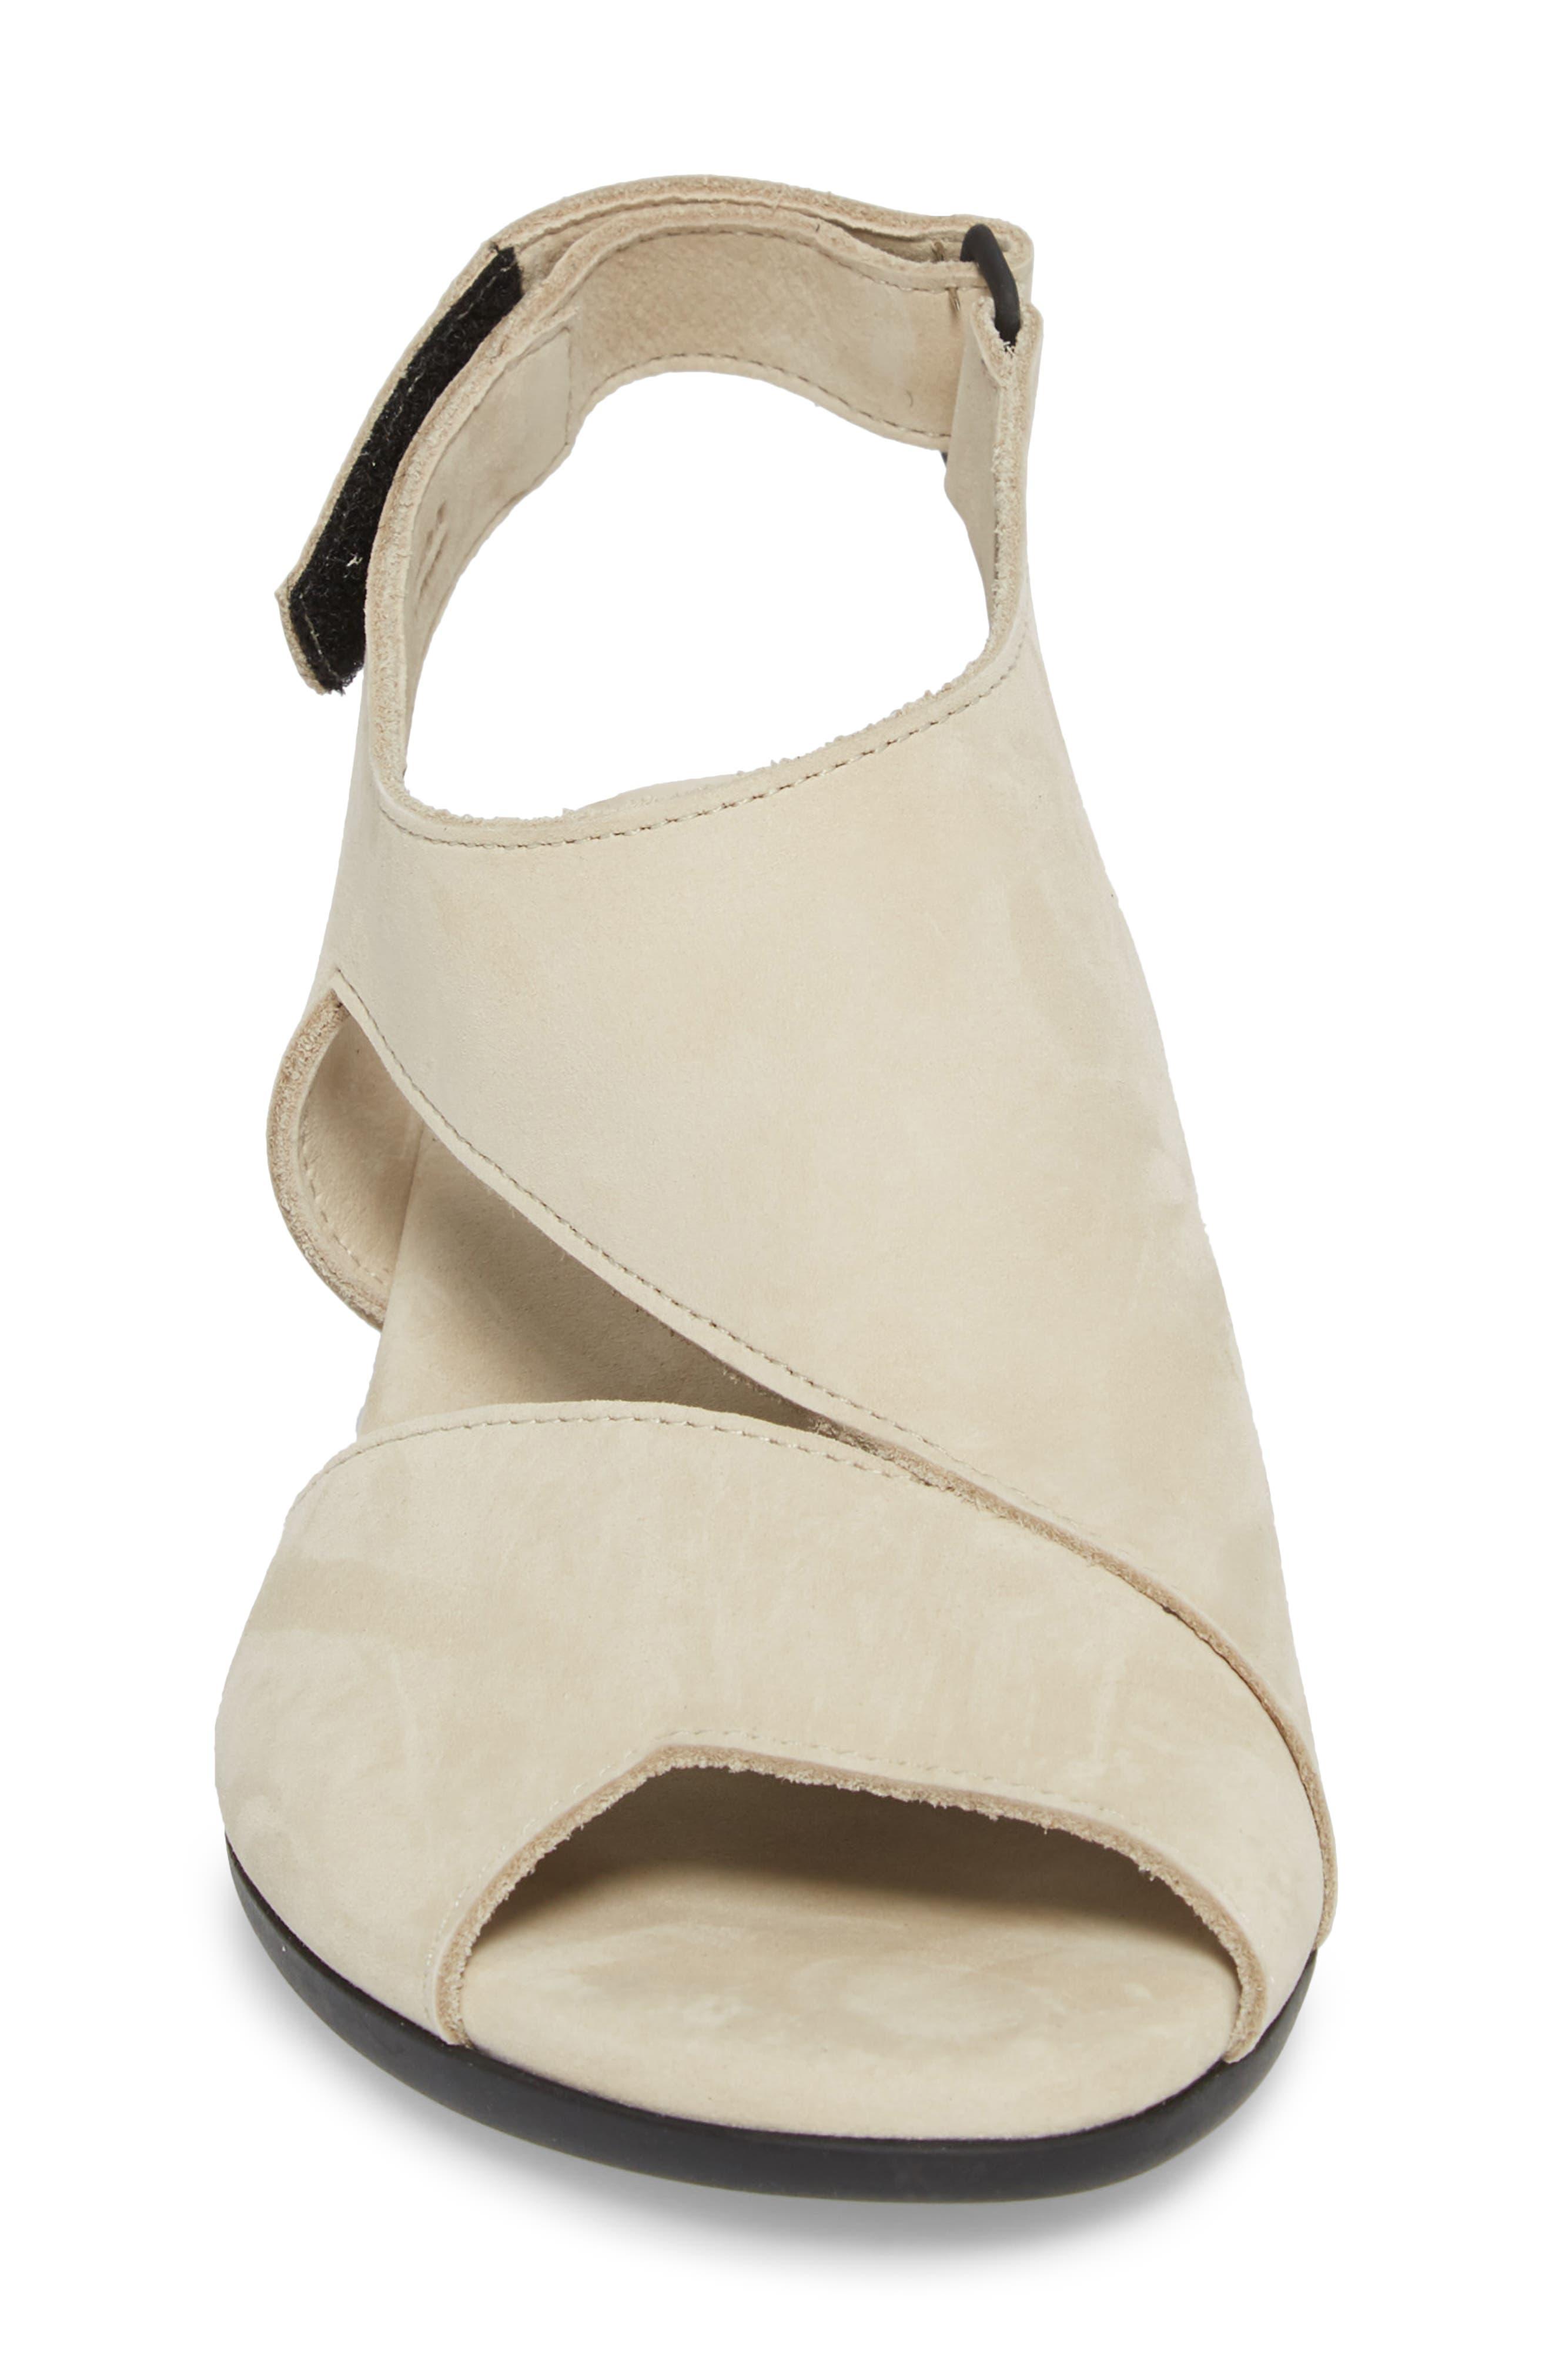 Obibbi Asymmetrical Slingback Sandal,                             Alternate thumbnail 8, color,